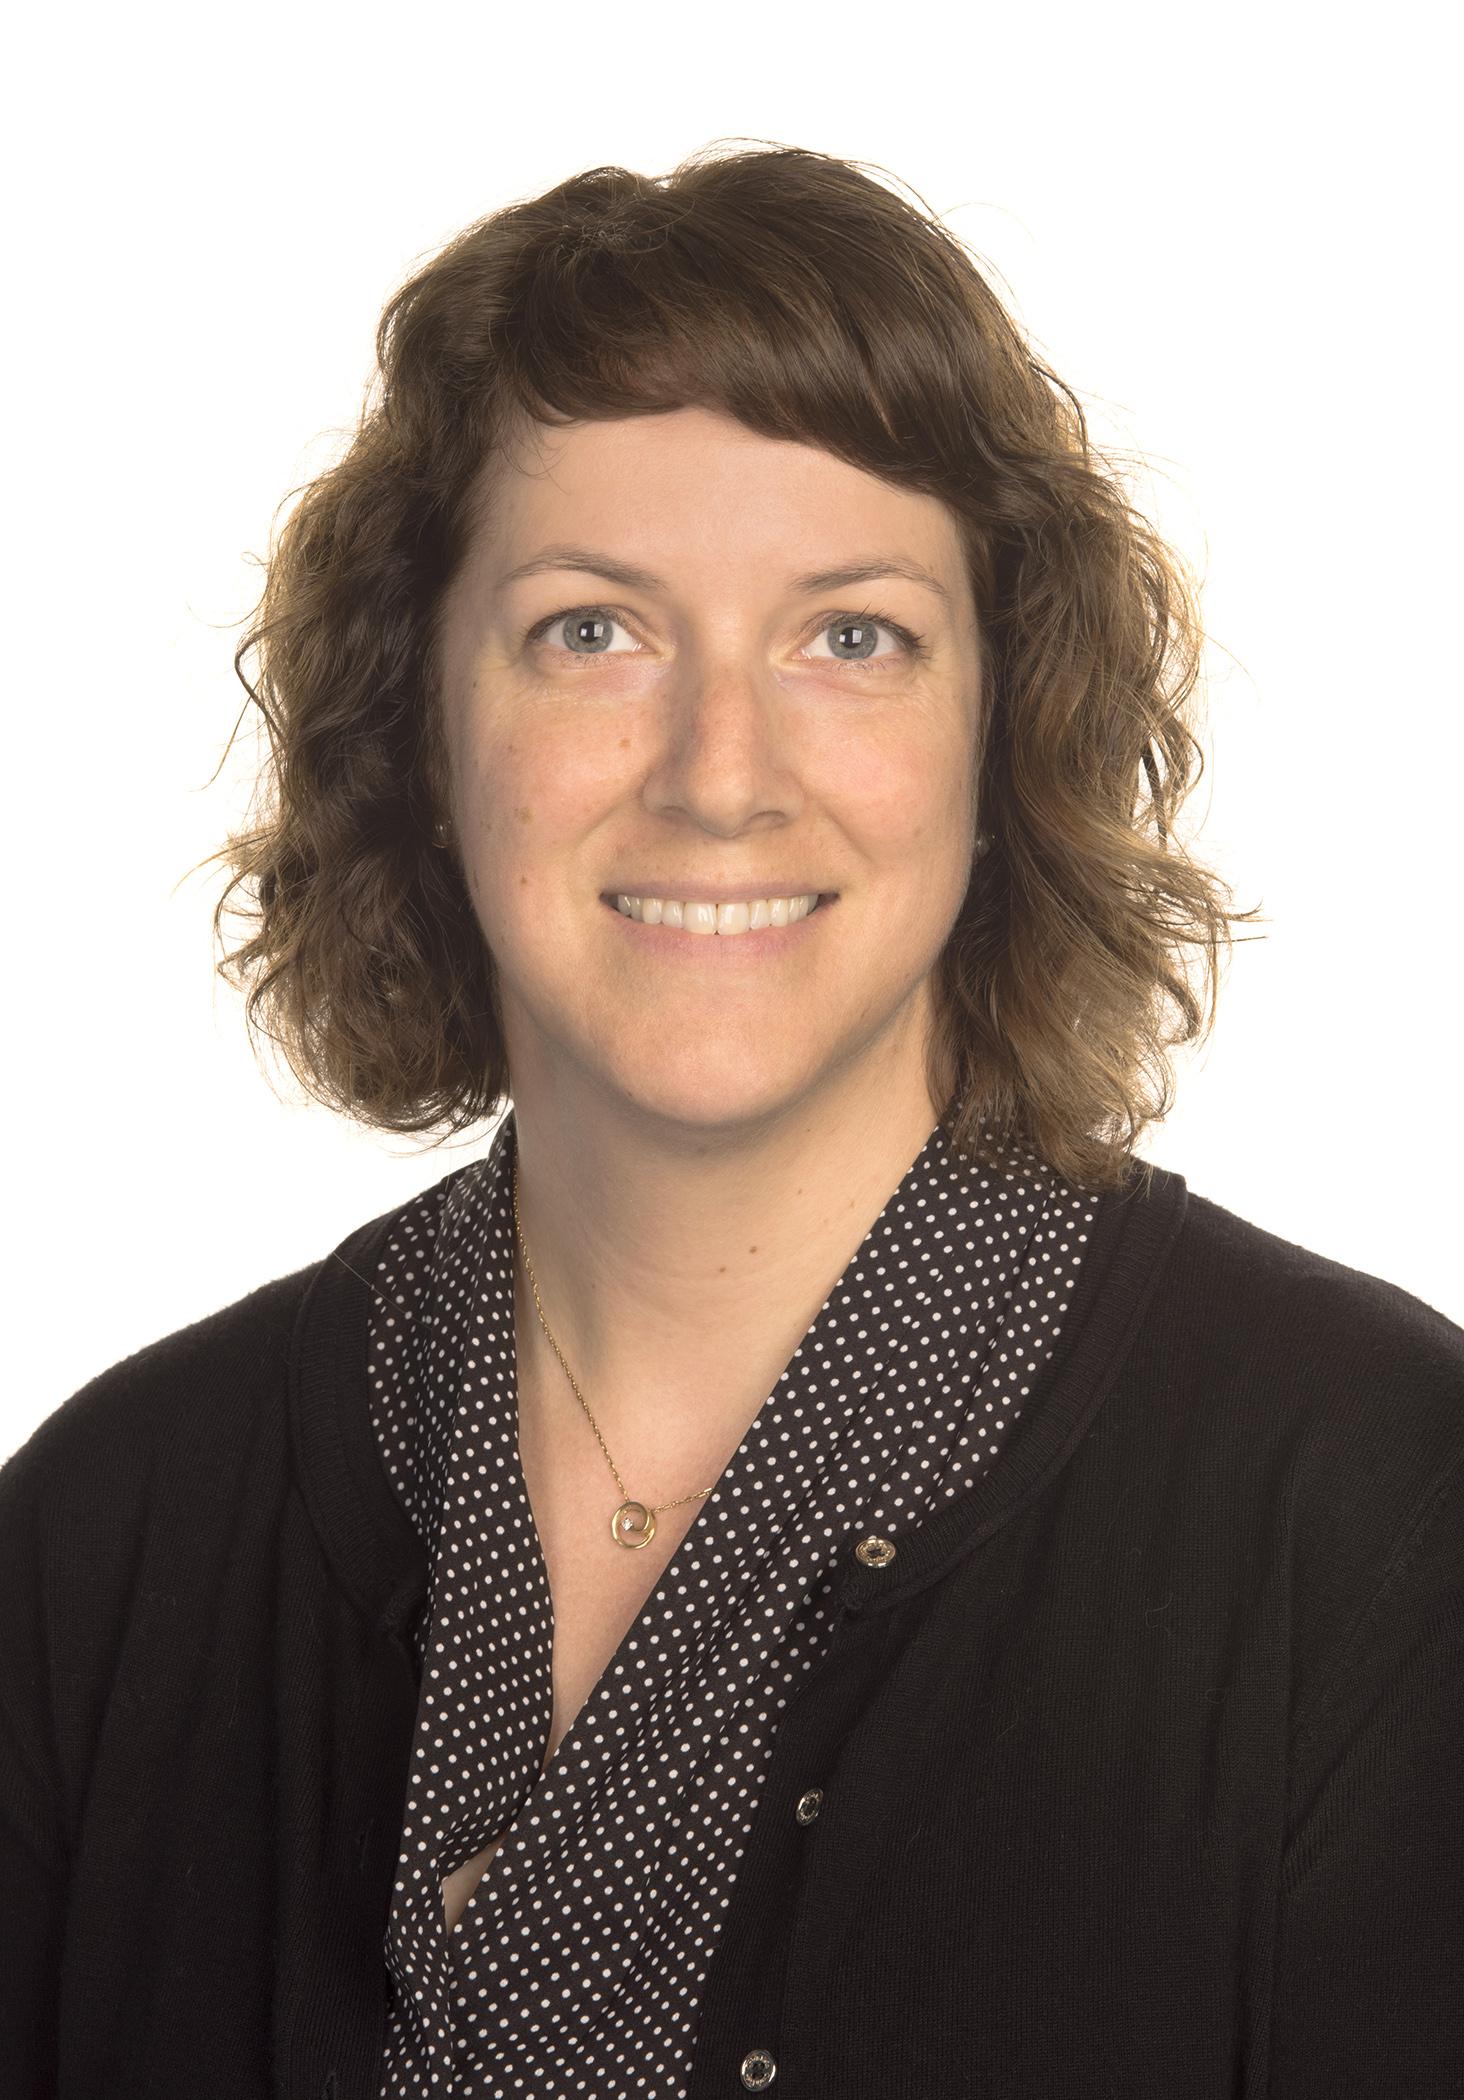 Sandy Pelletier